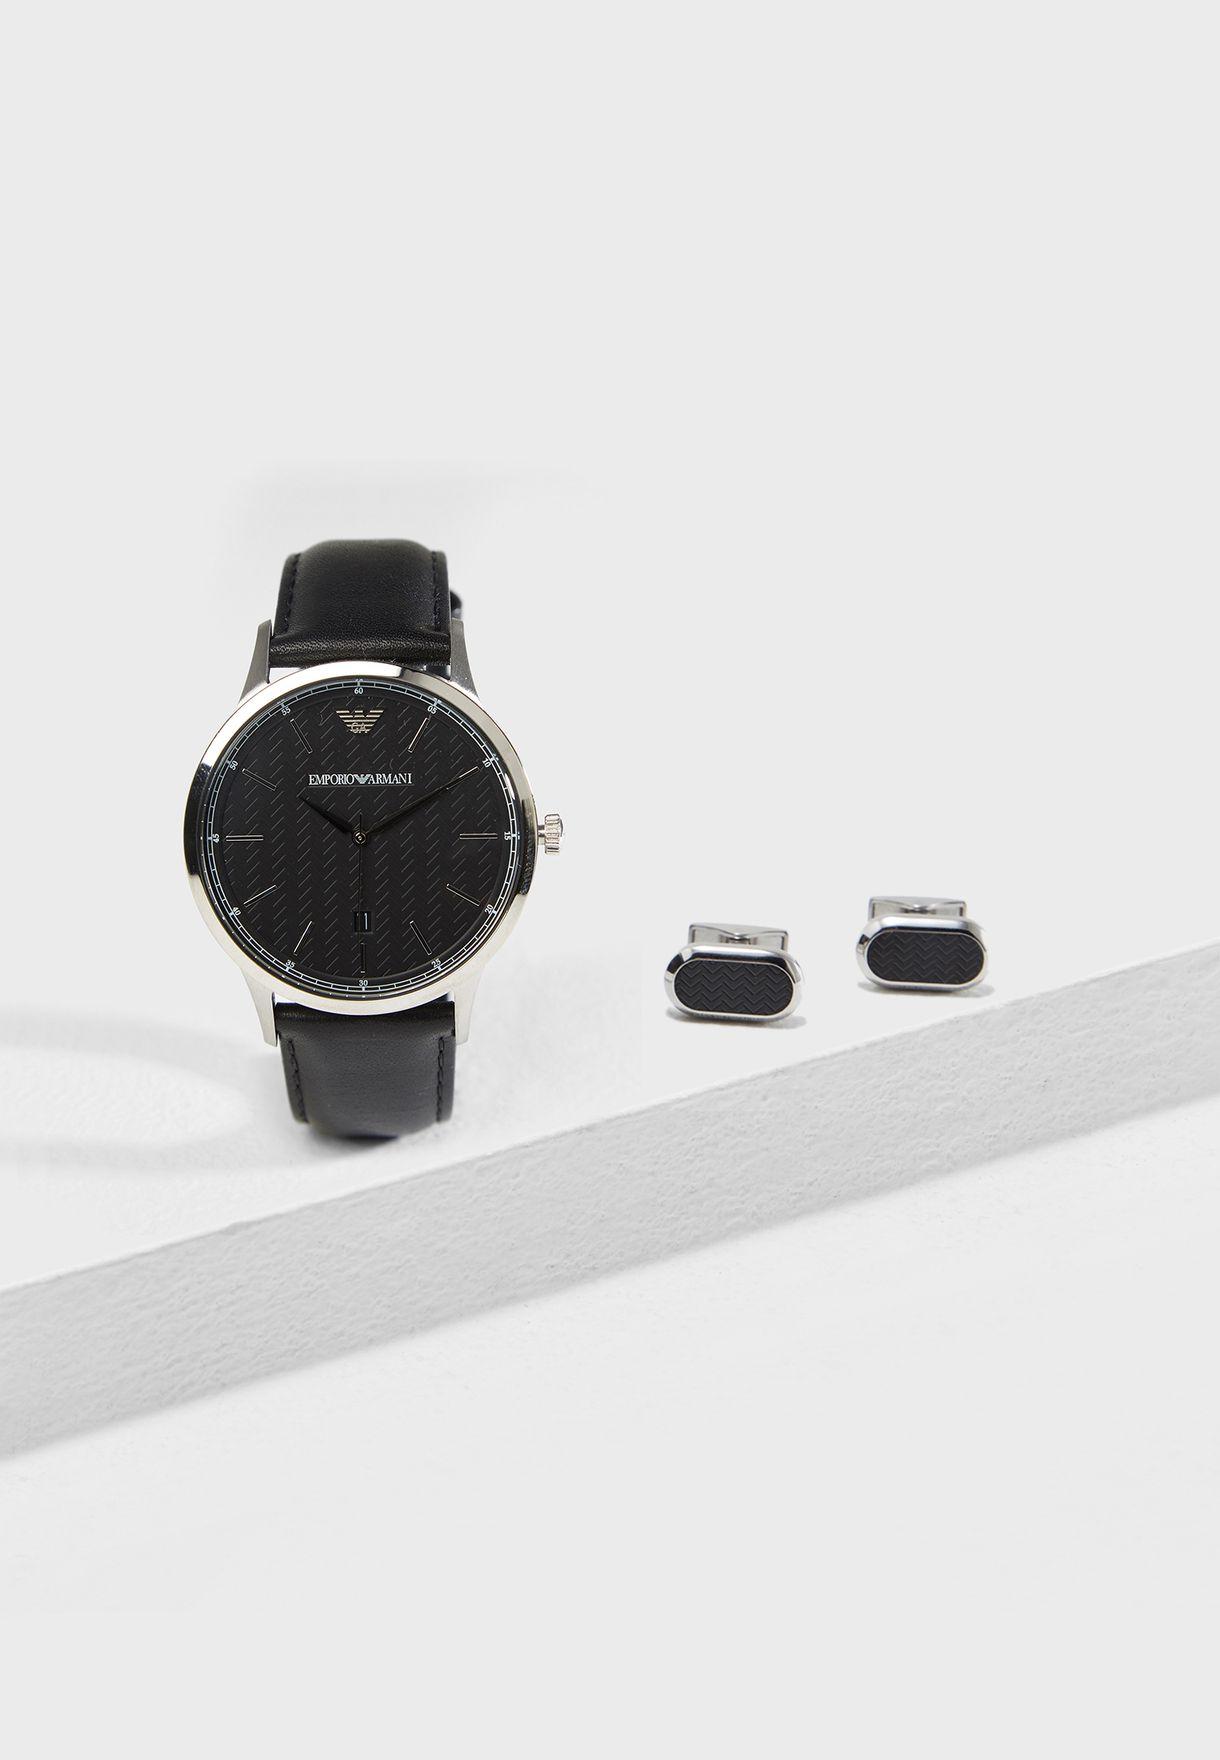 26e454c3e تسوق طقم (ساعة كلاسيكية + ازرار لأساور القميص) ماركة امبريو ارماني ...